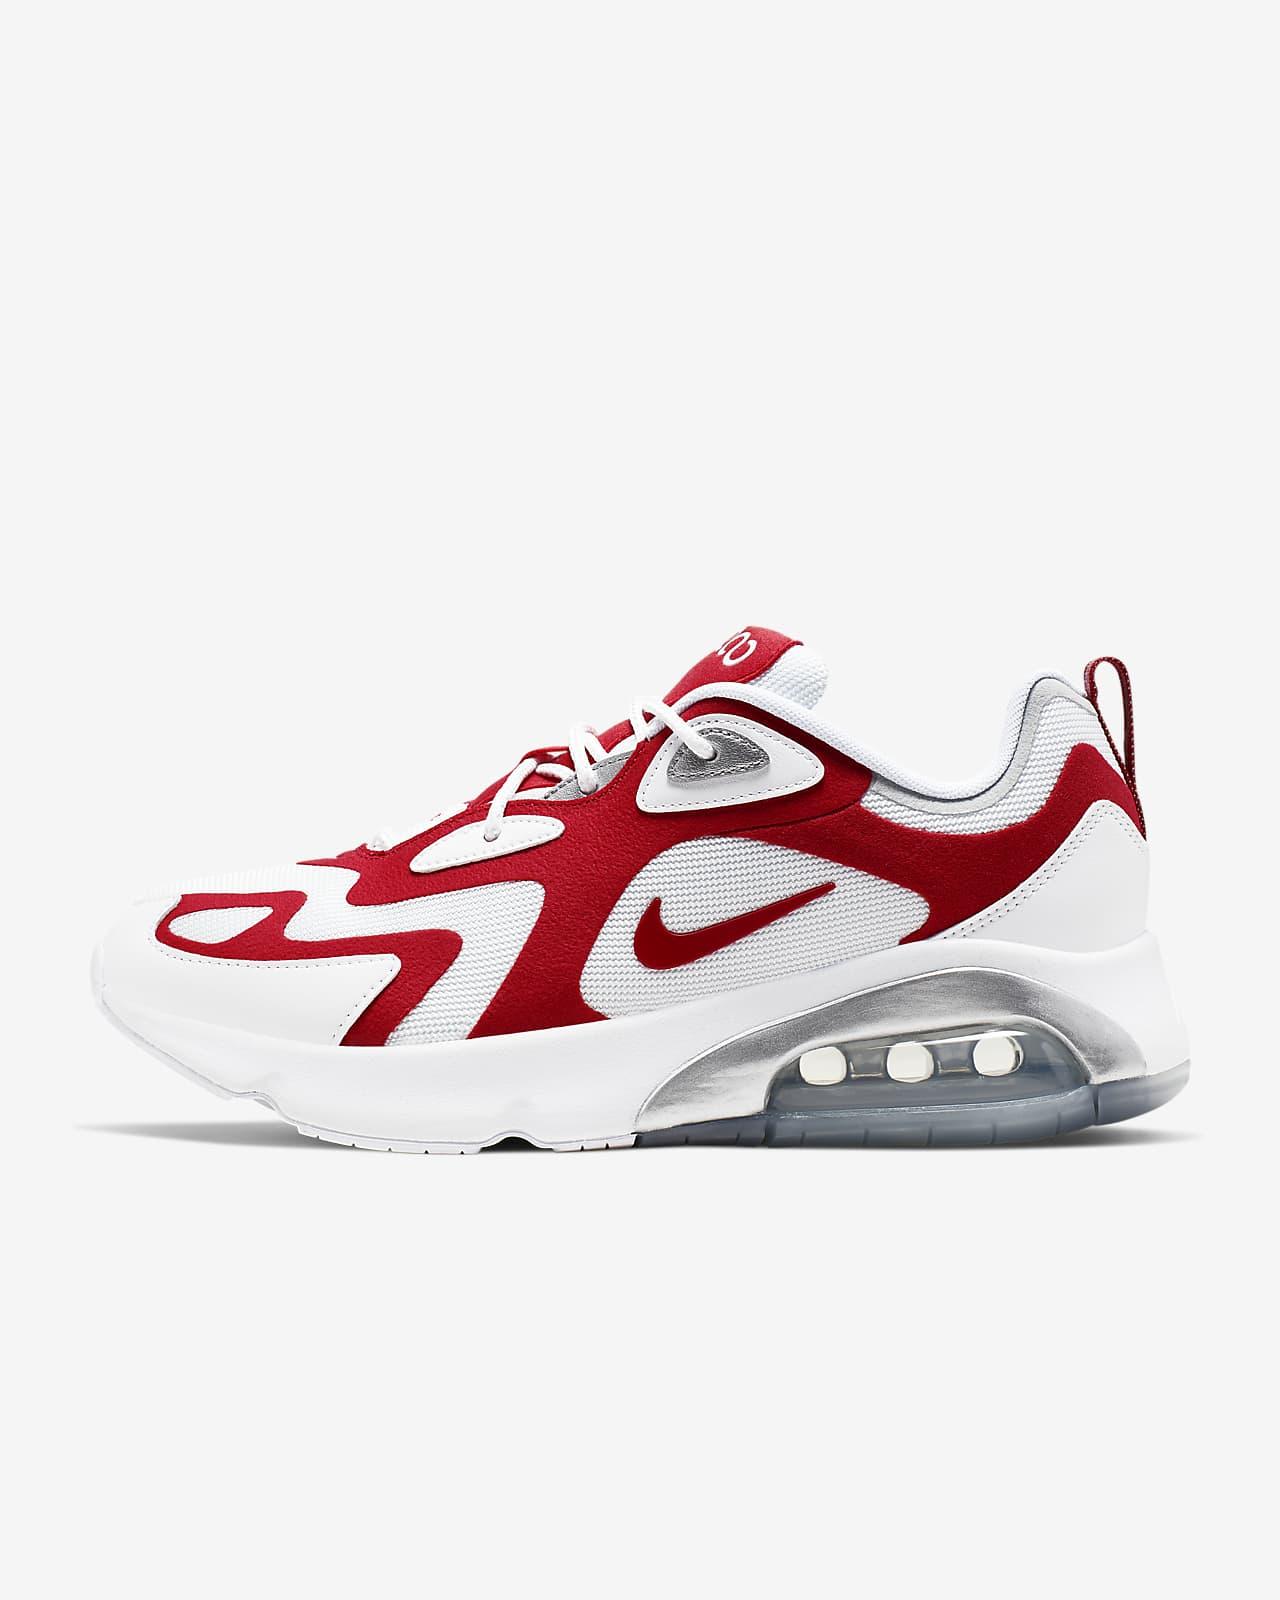 Nike Air Max 200 (Dunk of Death) Men's Shoe